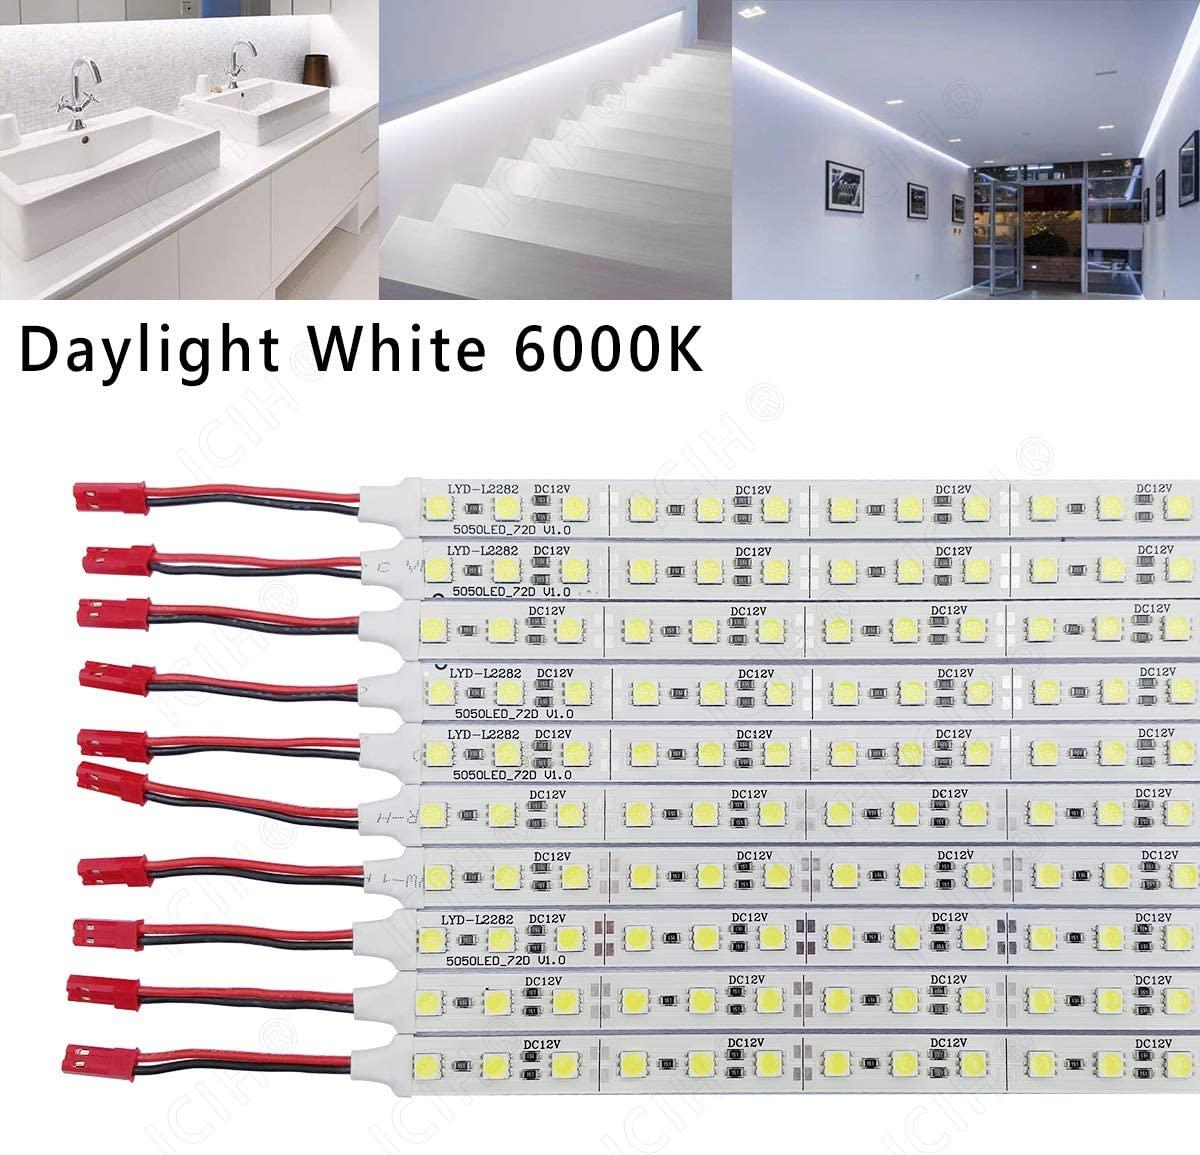 ICIH (Pack-10) Aluminum Rigid Hard LED Strip Light Daylight White 6000K SMD5050 12V LED 36LED/0.5M/7W Super Bright Led Bar with Import Stronger Stickiness Double Sided Adhesive Tape IH-LRS-5050DW